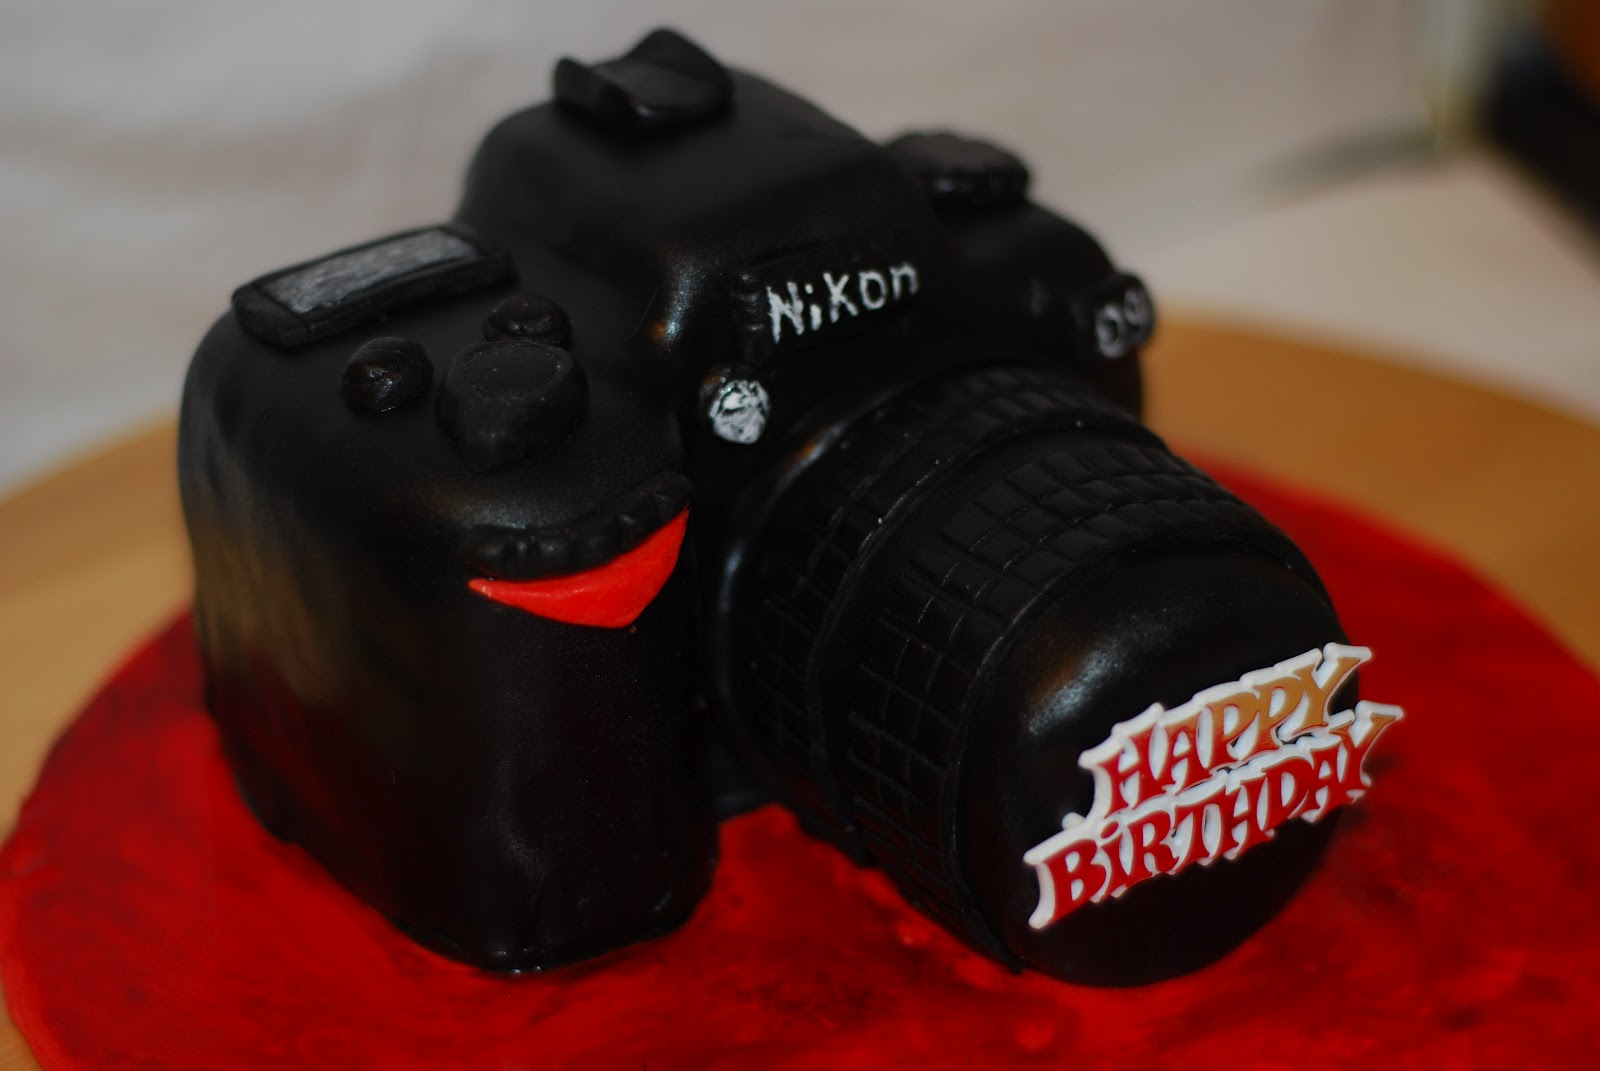 Nikon Camera Cake Images : Bitter-Sweet Bakery: Nikon D90 Camera Cake (White ...